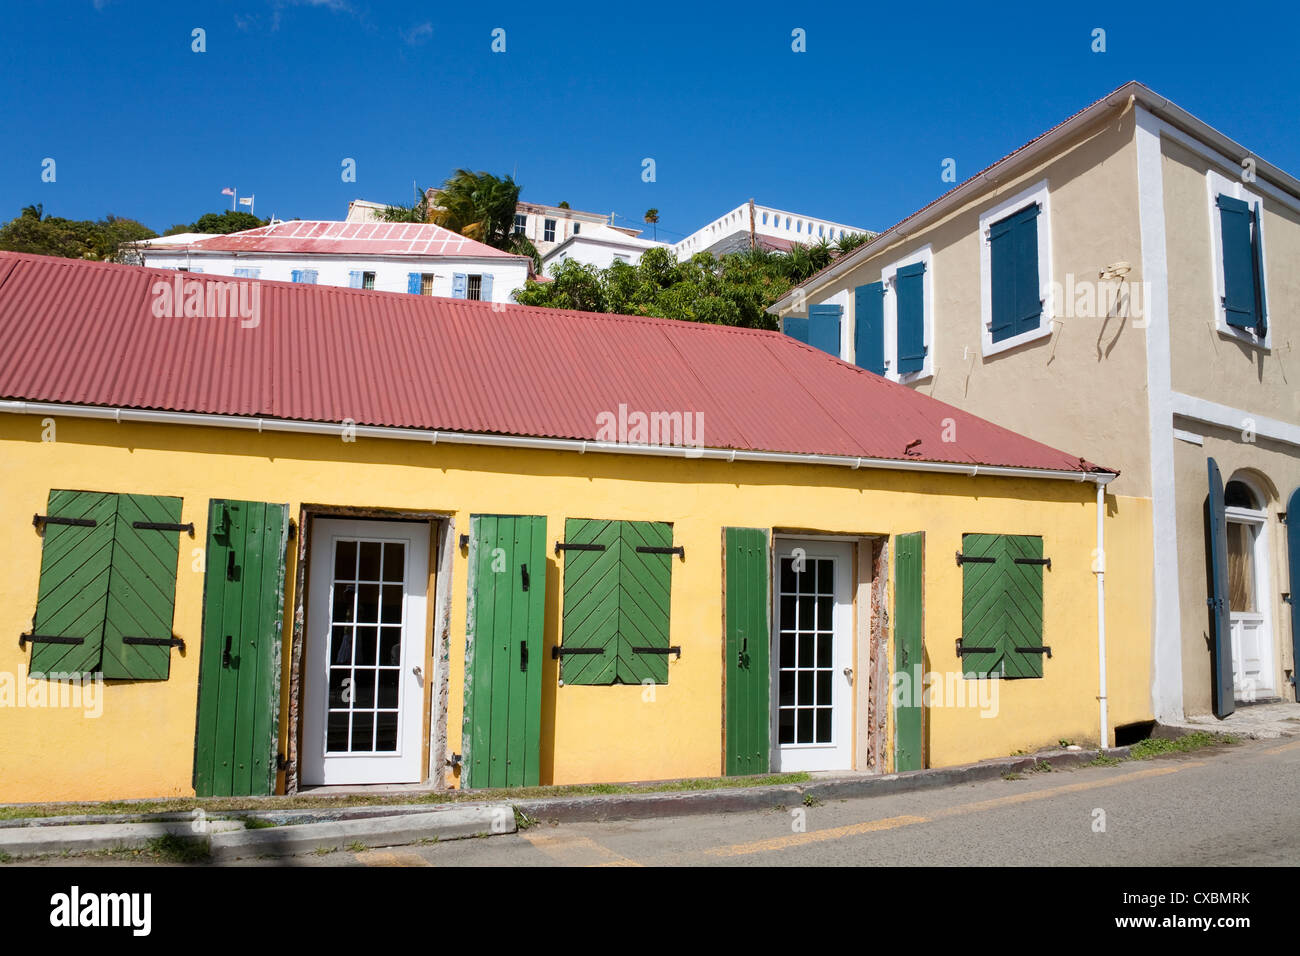 Back Street in Charlotte Amalie, St. Thomas Island, U.S. Virgin Islands, West Indies, Caribbean, Central America Stock Photo